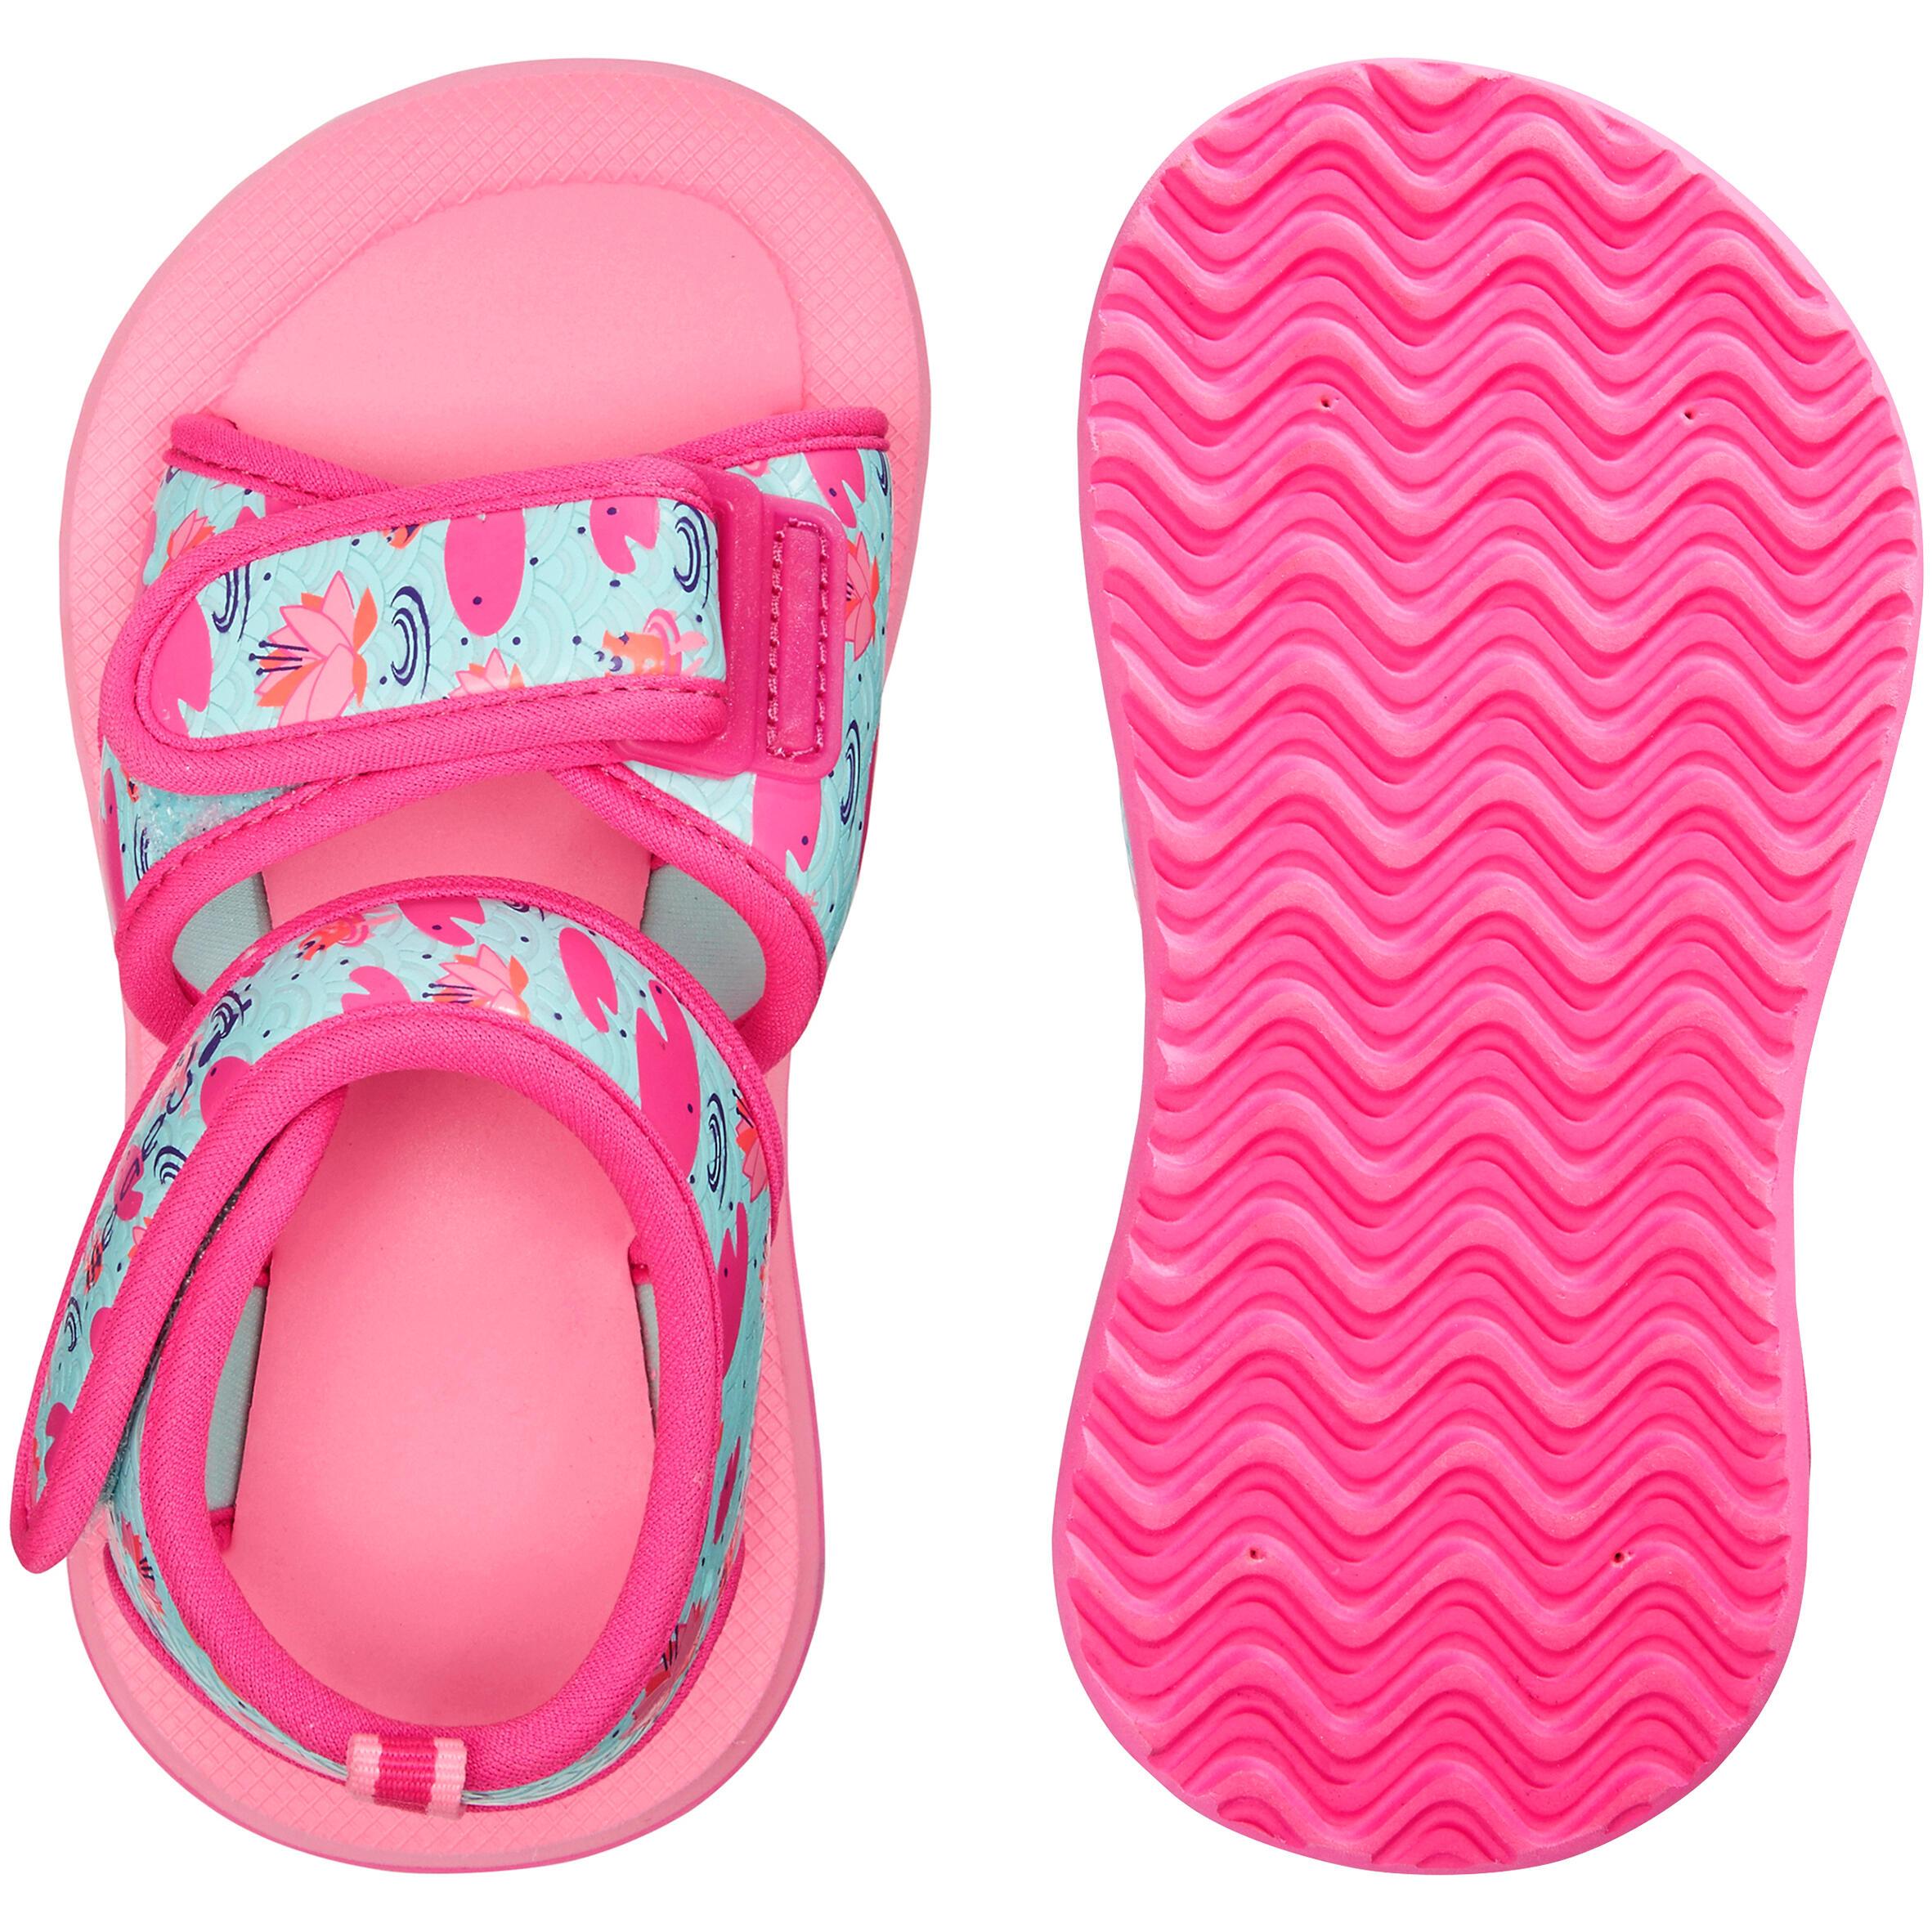 Sandale Înot Roz Bebe imagine